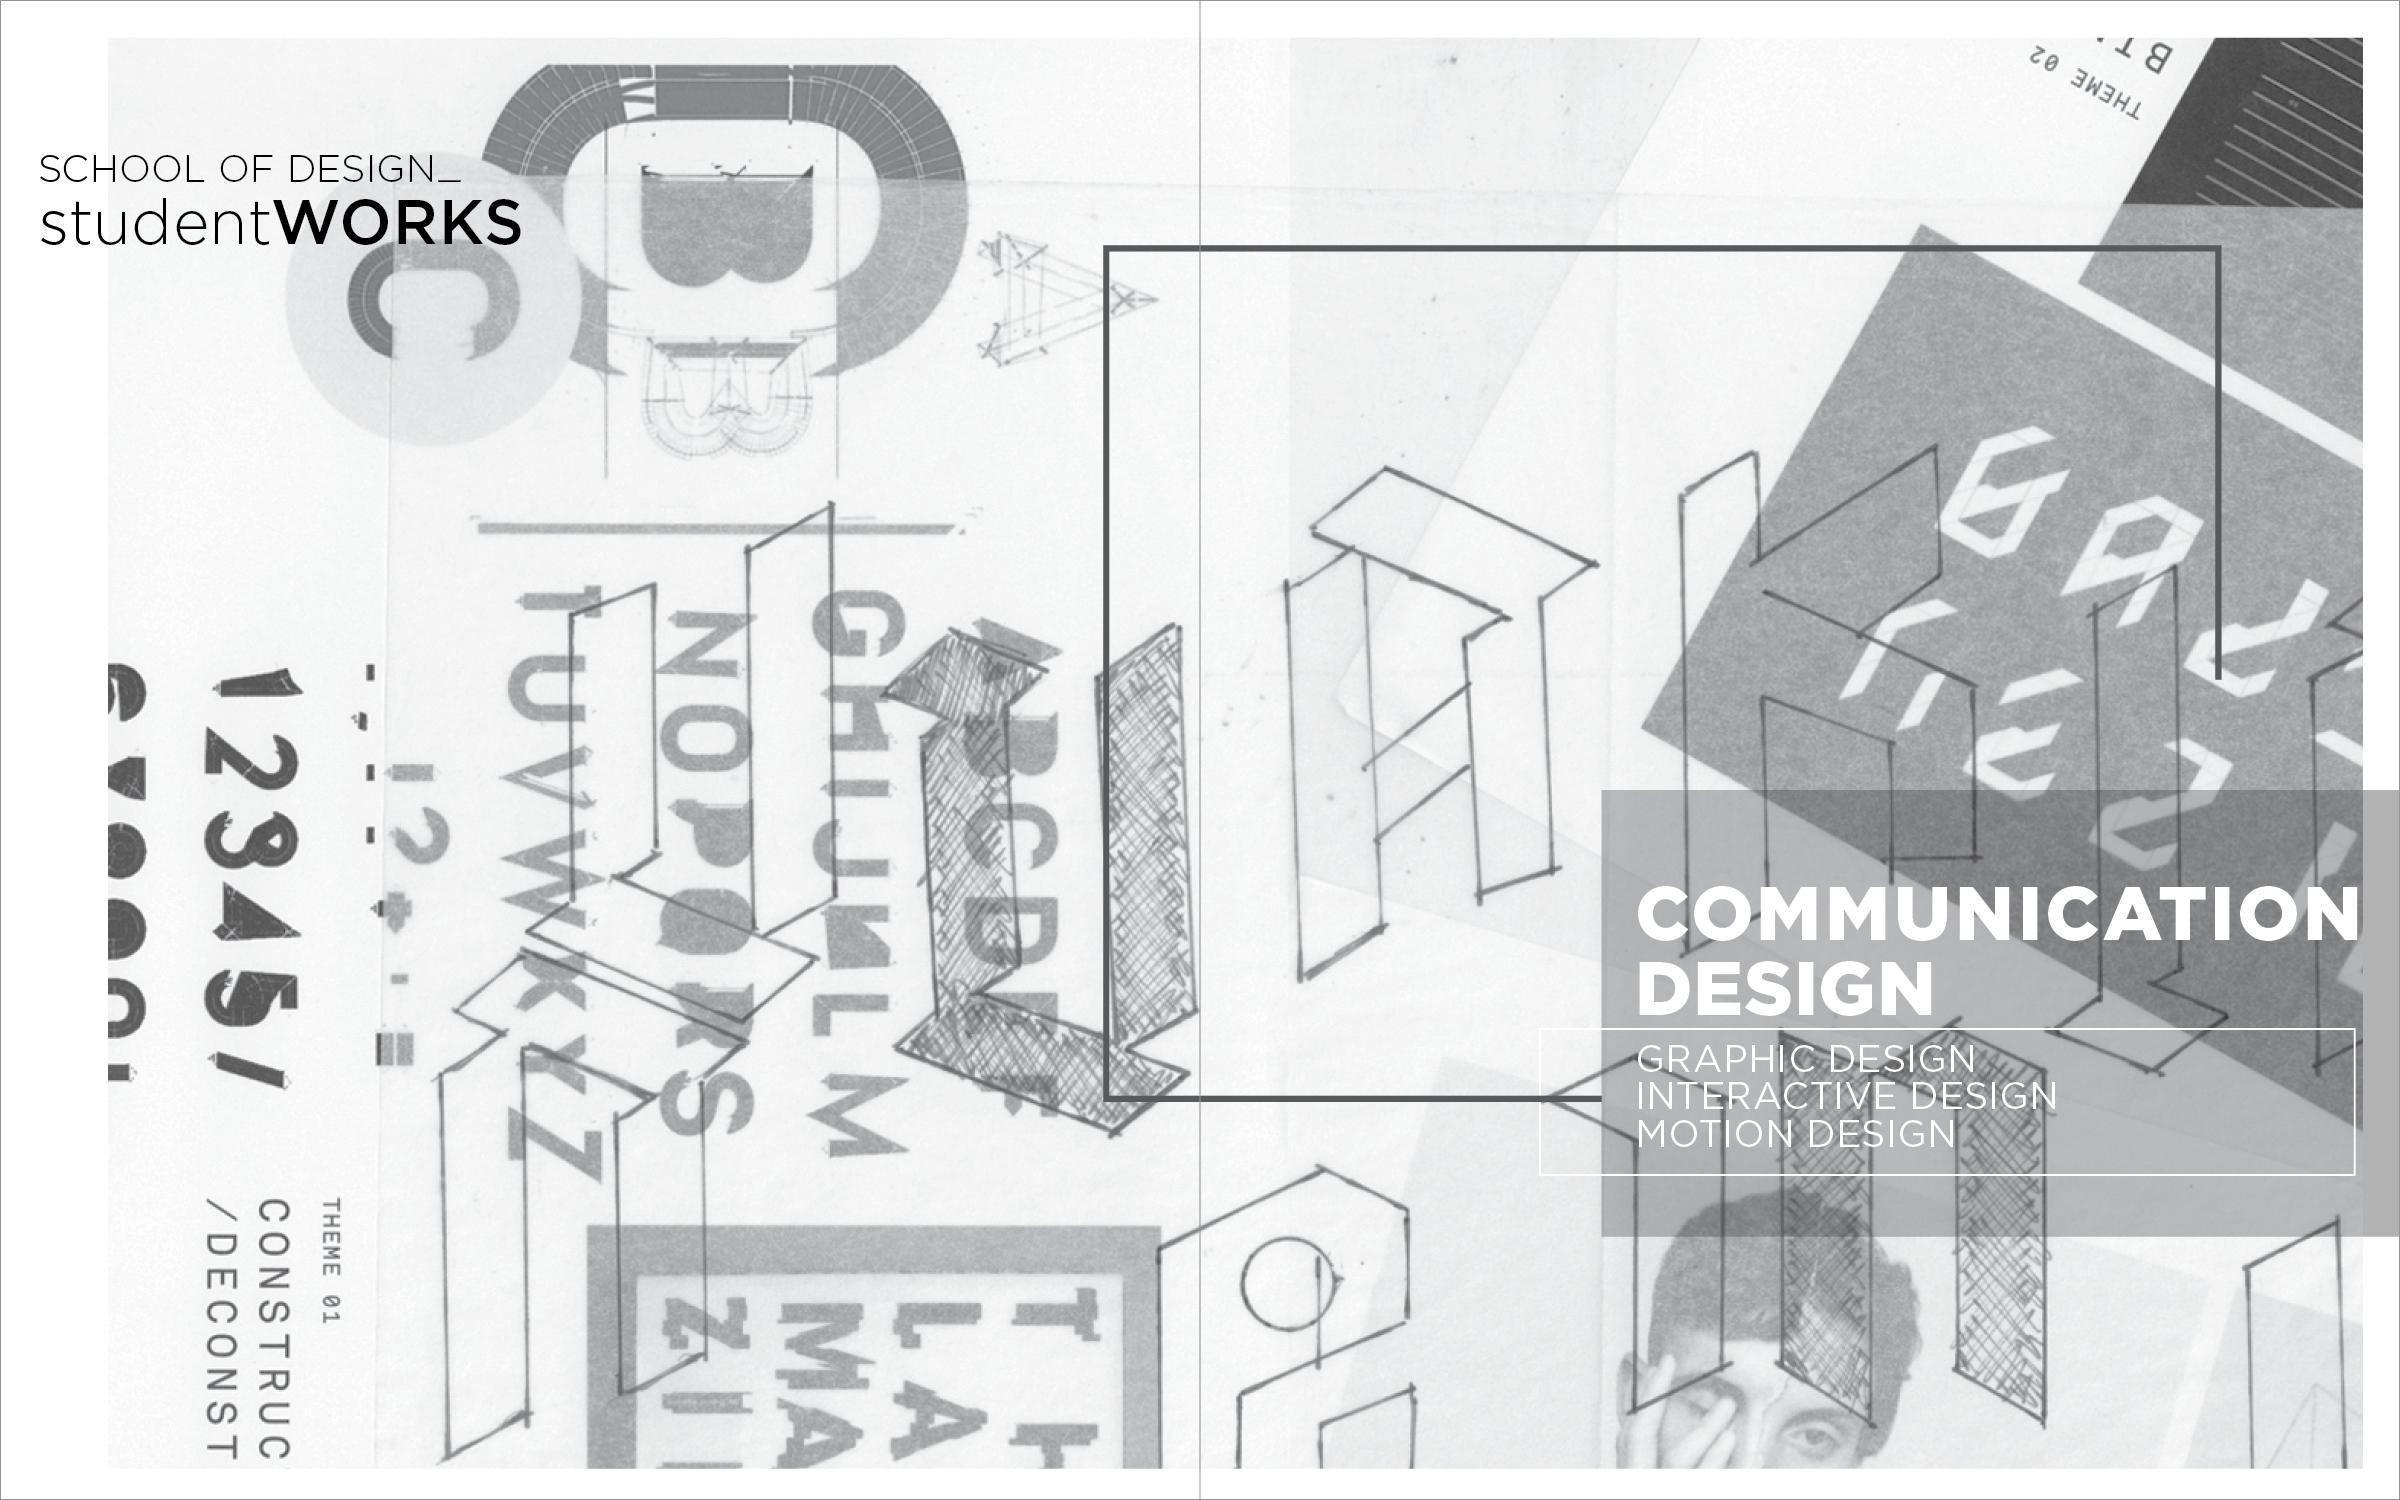 DAAPworksBook_2Design7.jpg